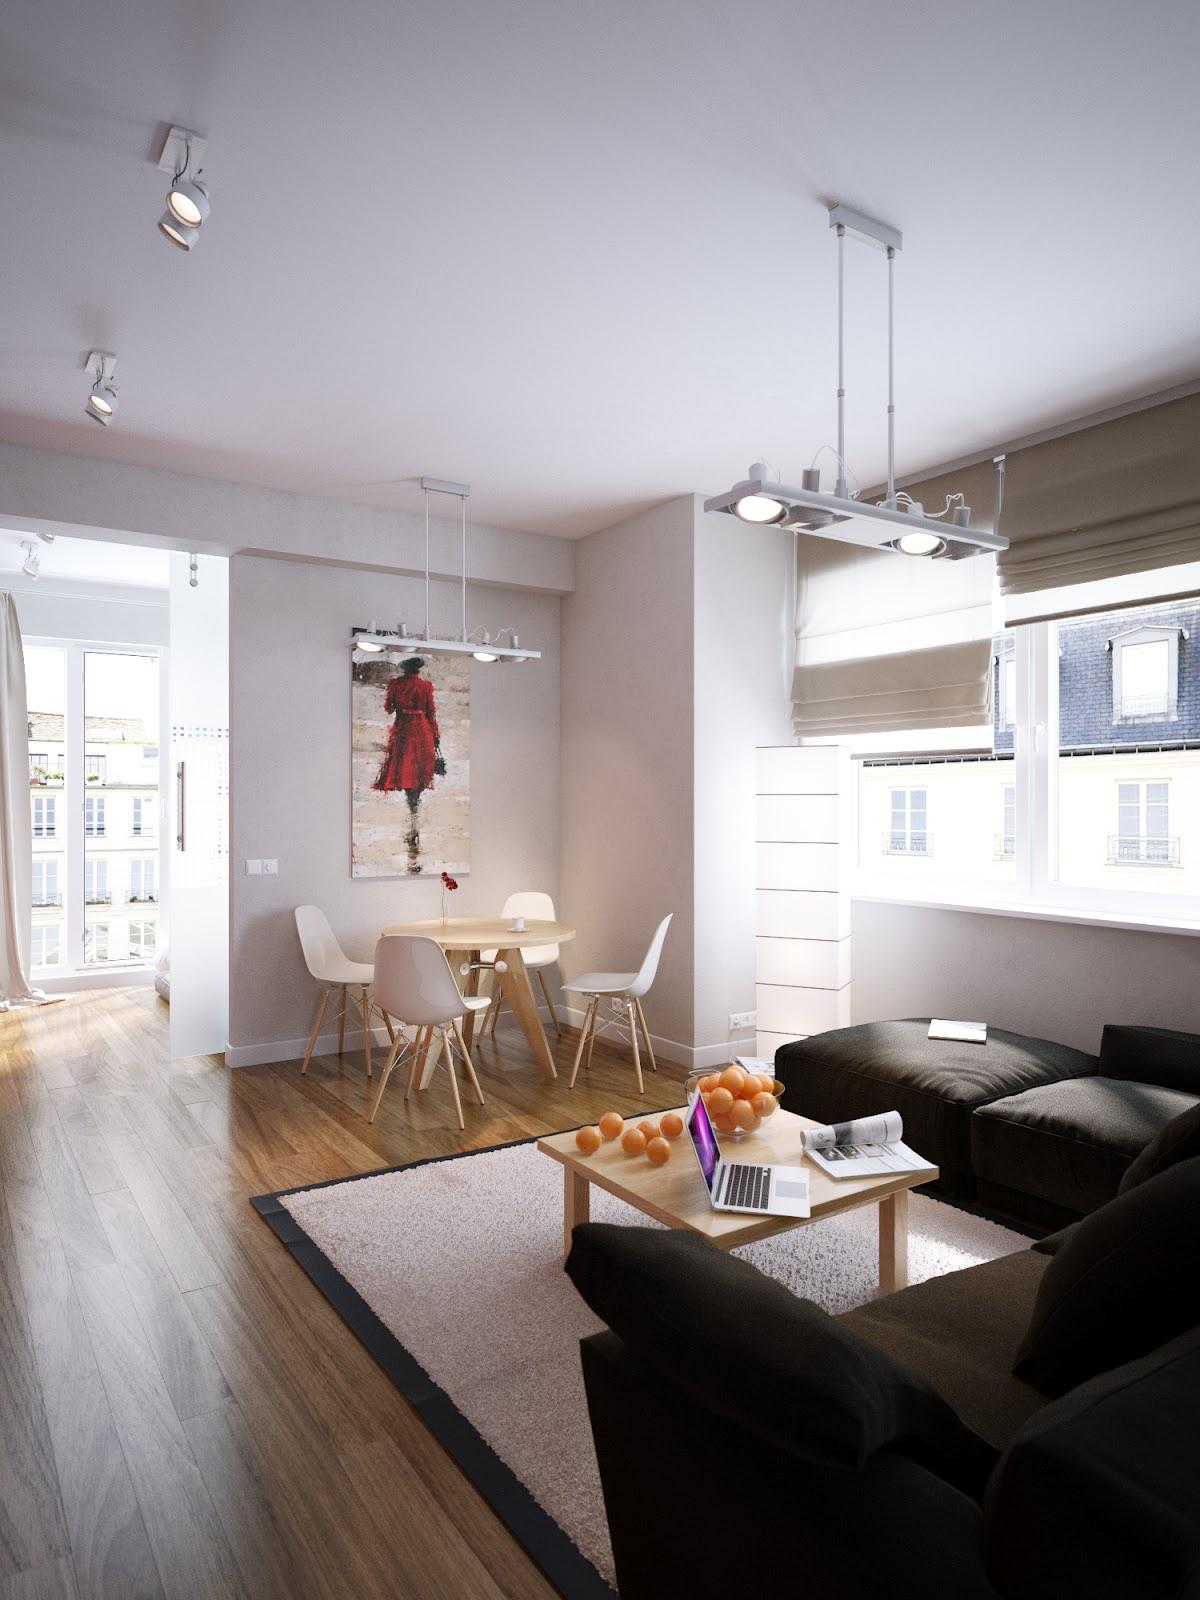 Designall20 Model Desain Apartemen Modern Bernuansa Merah